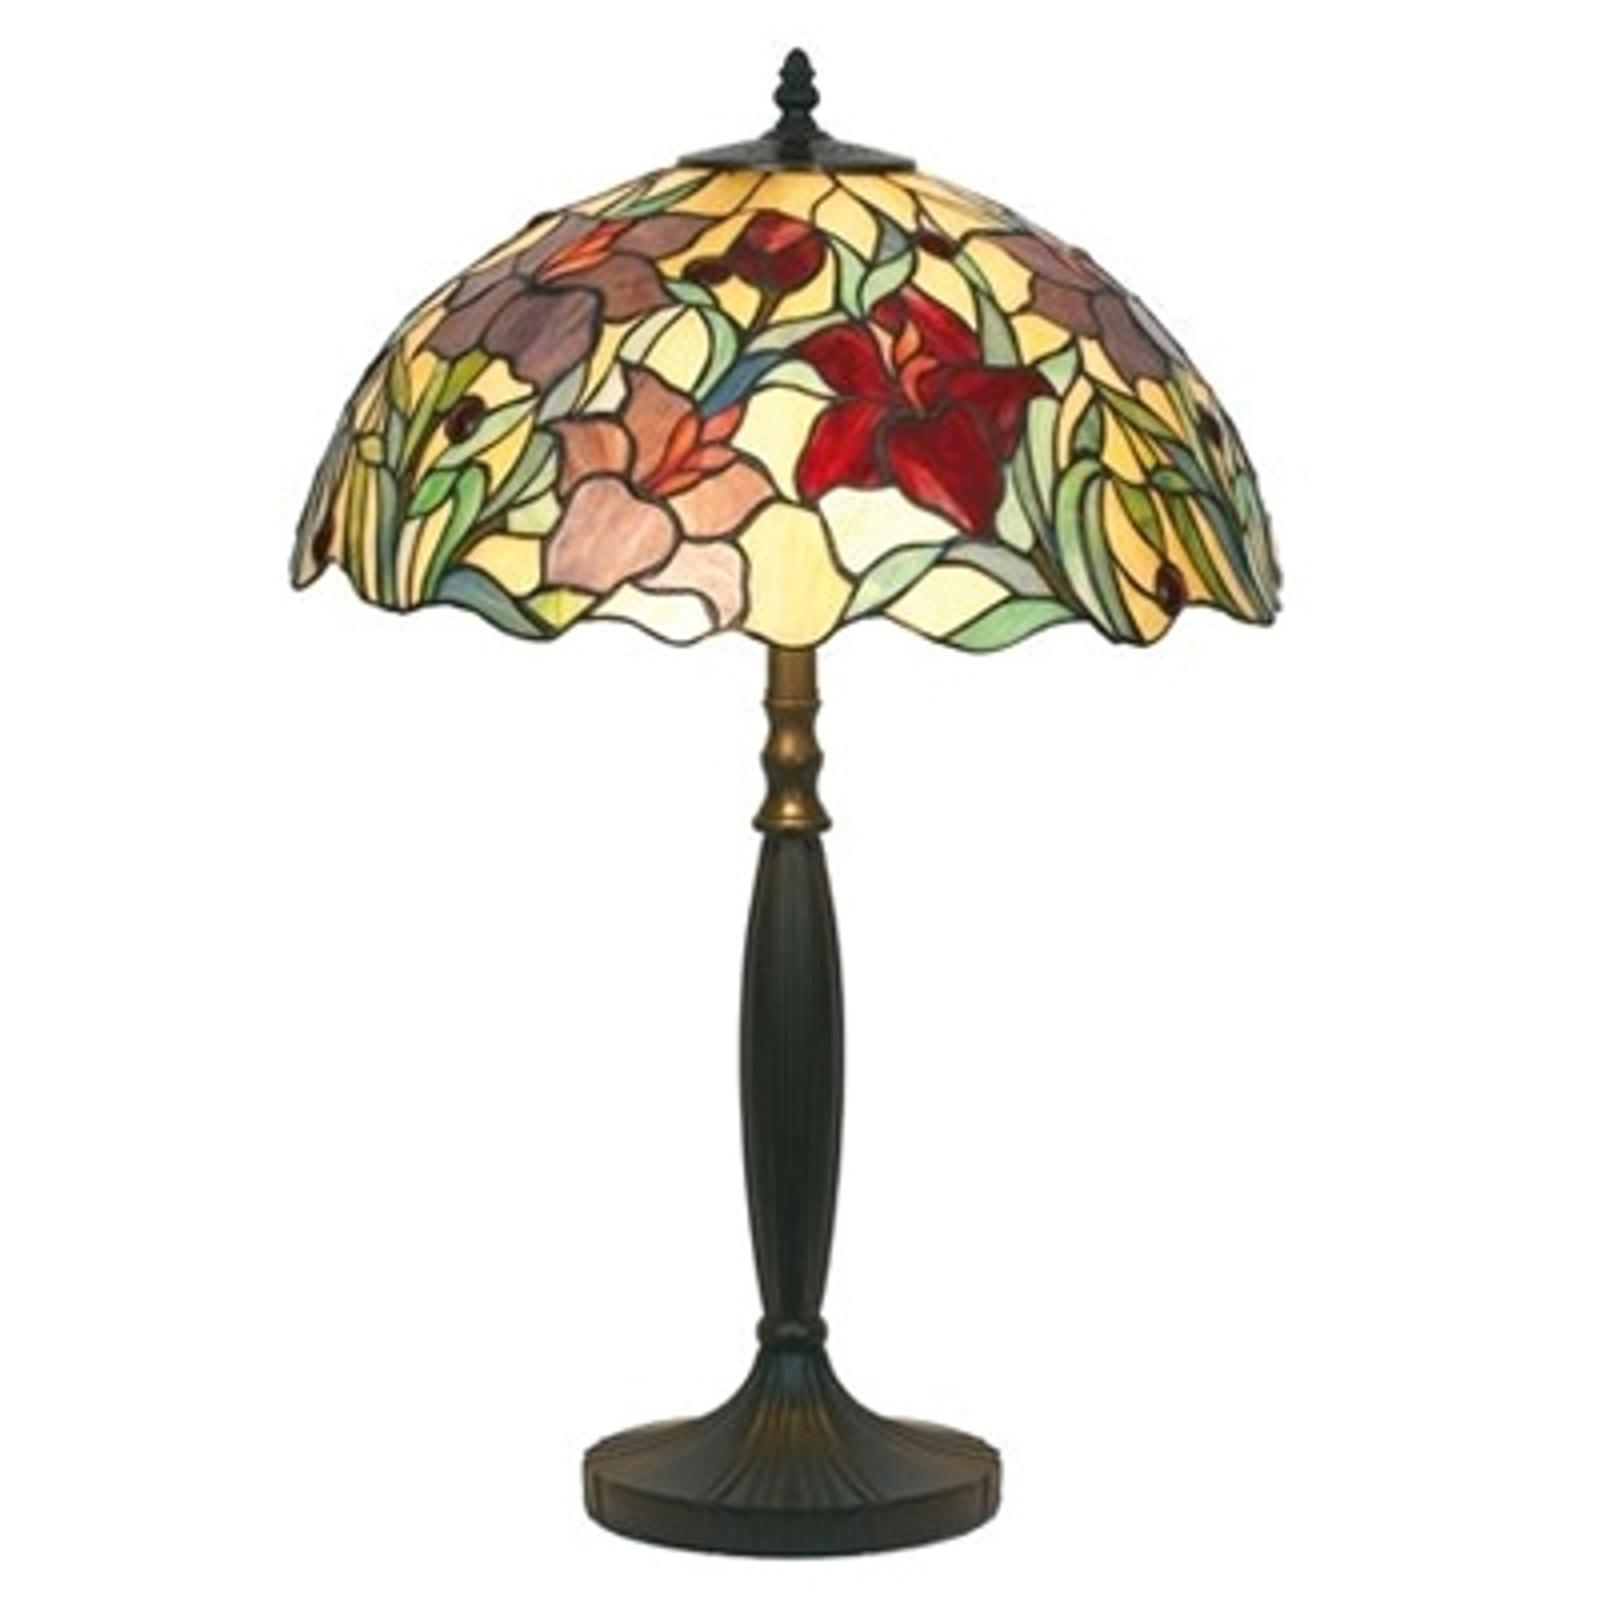 ATHINA - blomstret bordlampe, håndlavet, 62 cm